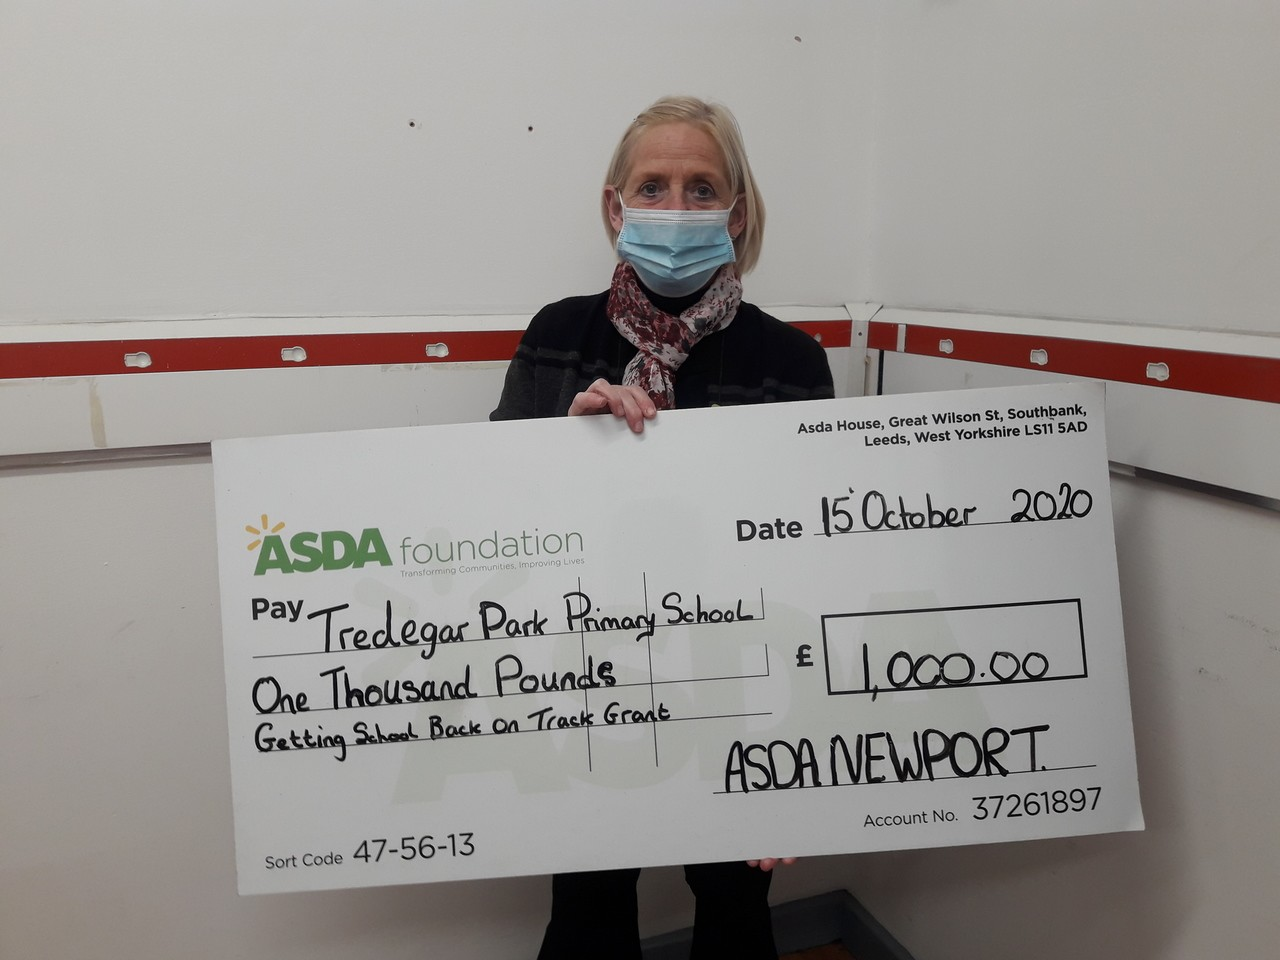 £1,000 for primary school   Asda Newport